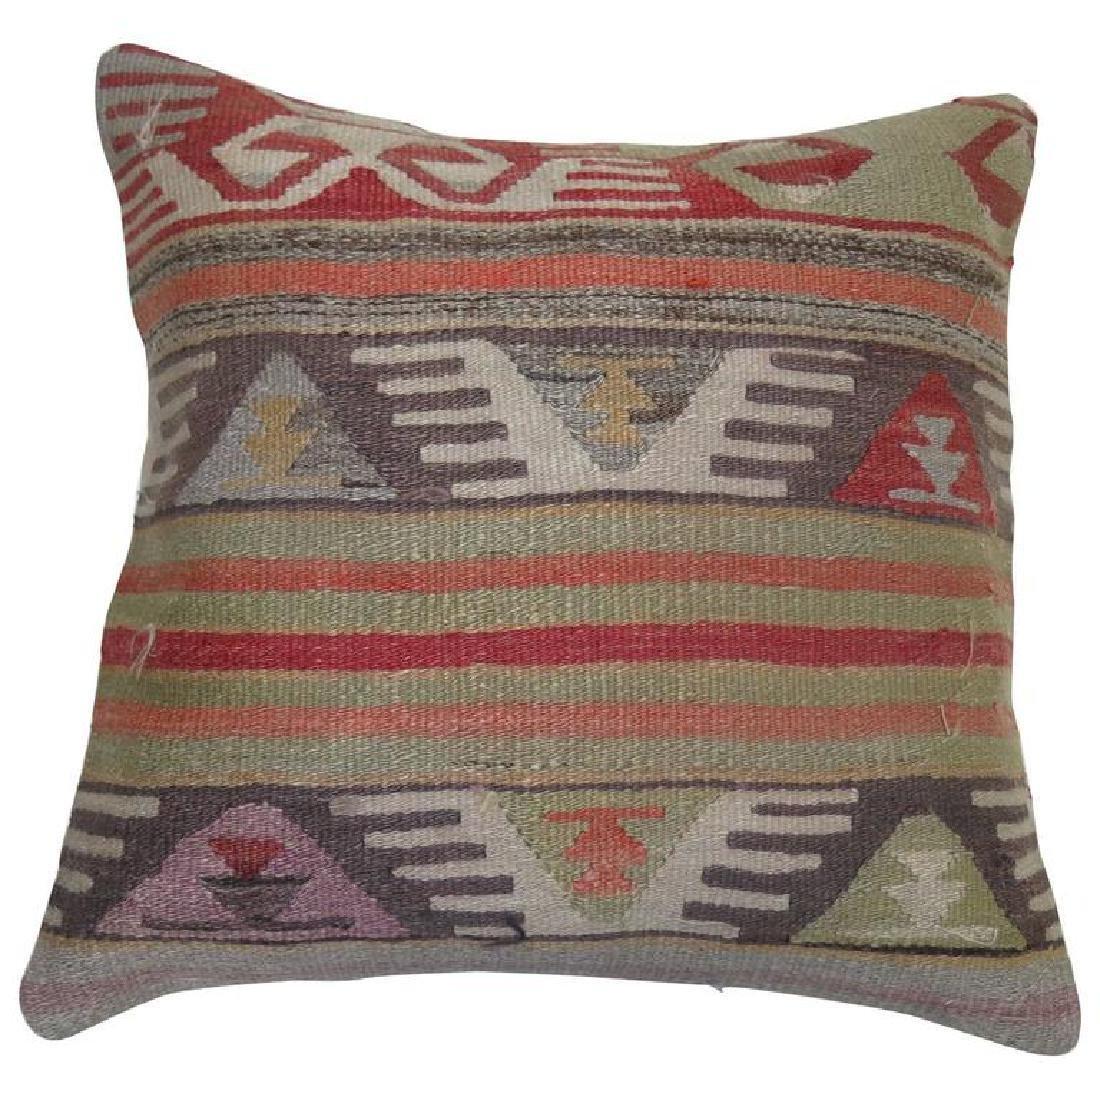 Turkish Kilim Rug Pillow 1.11x1.11